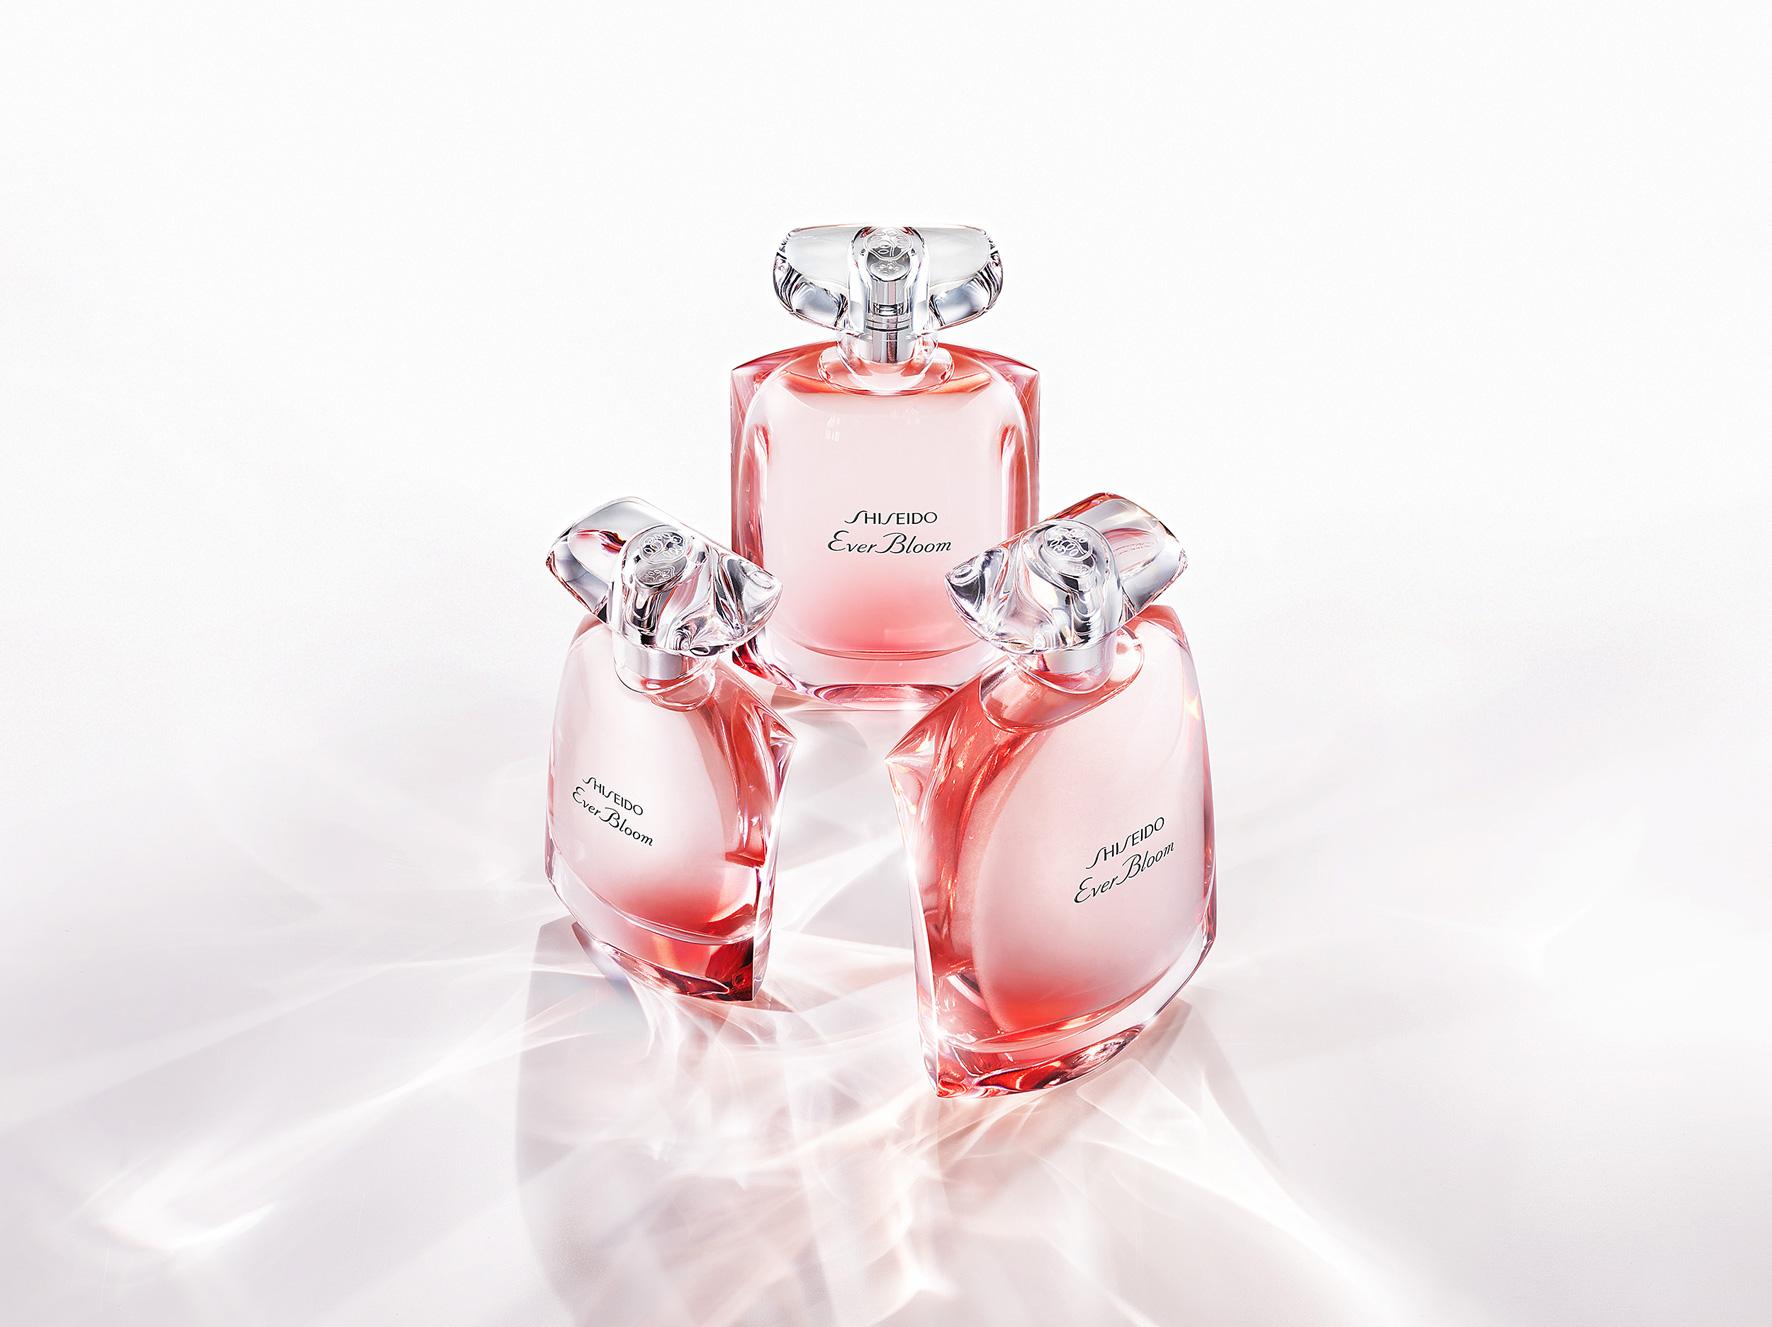 Ever Bloom, de Shiseido